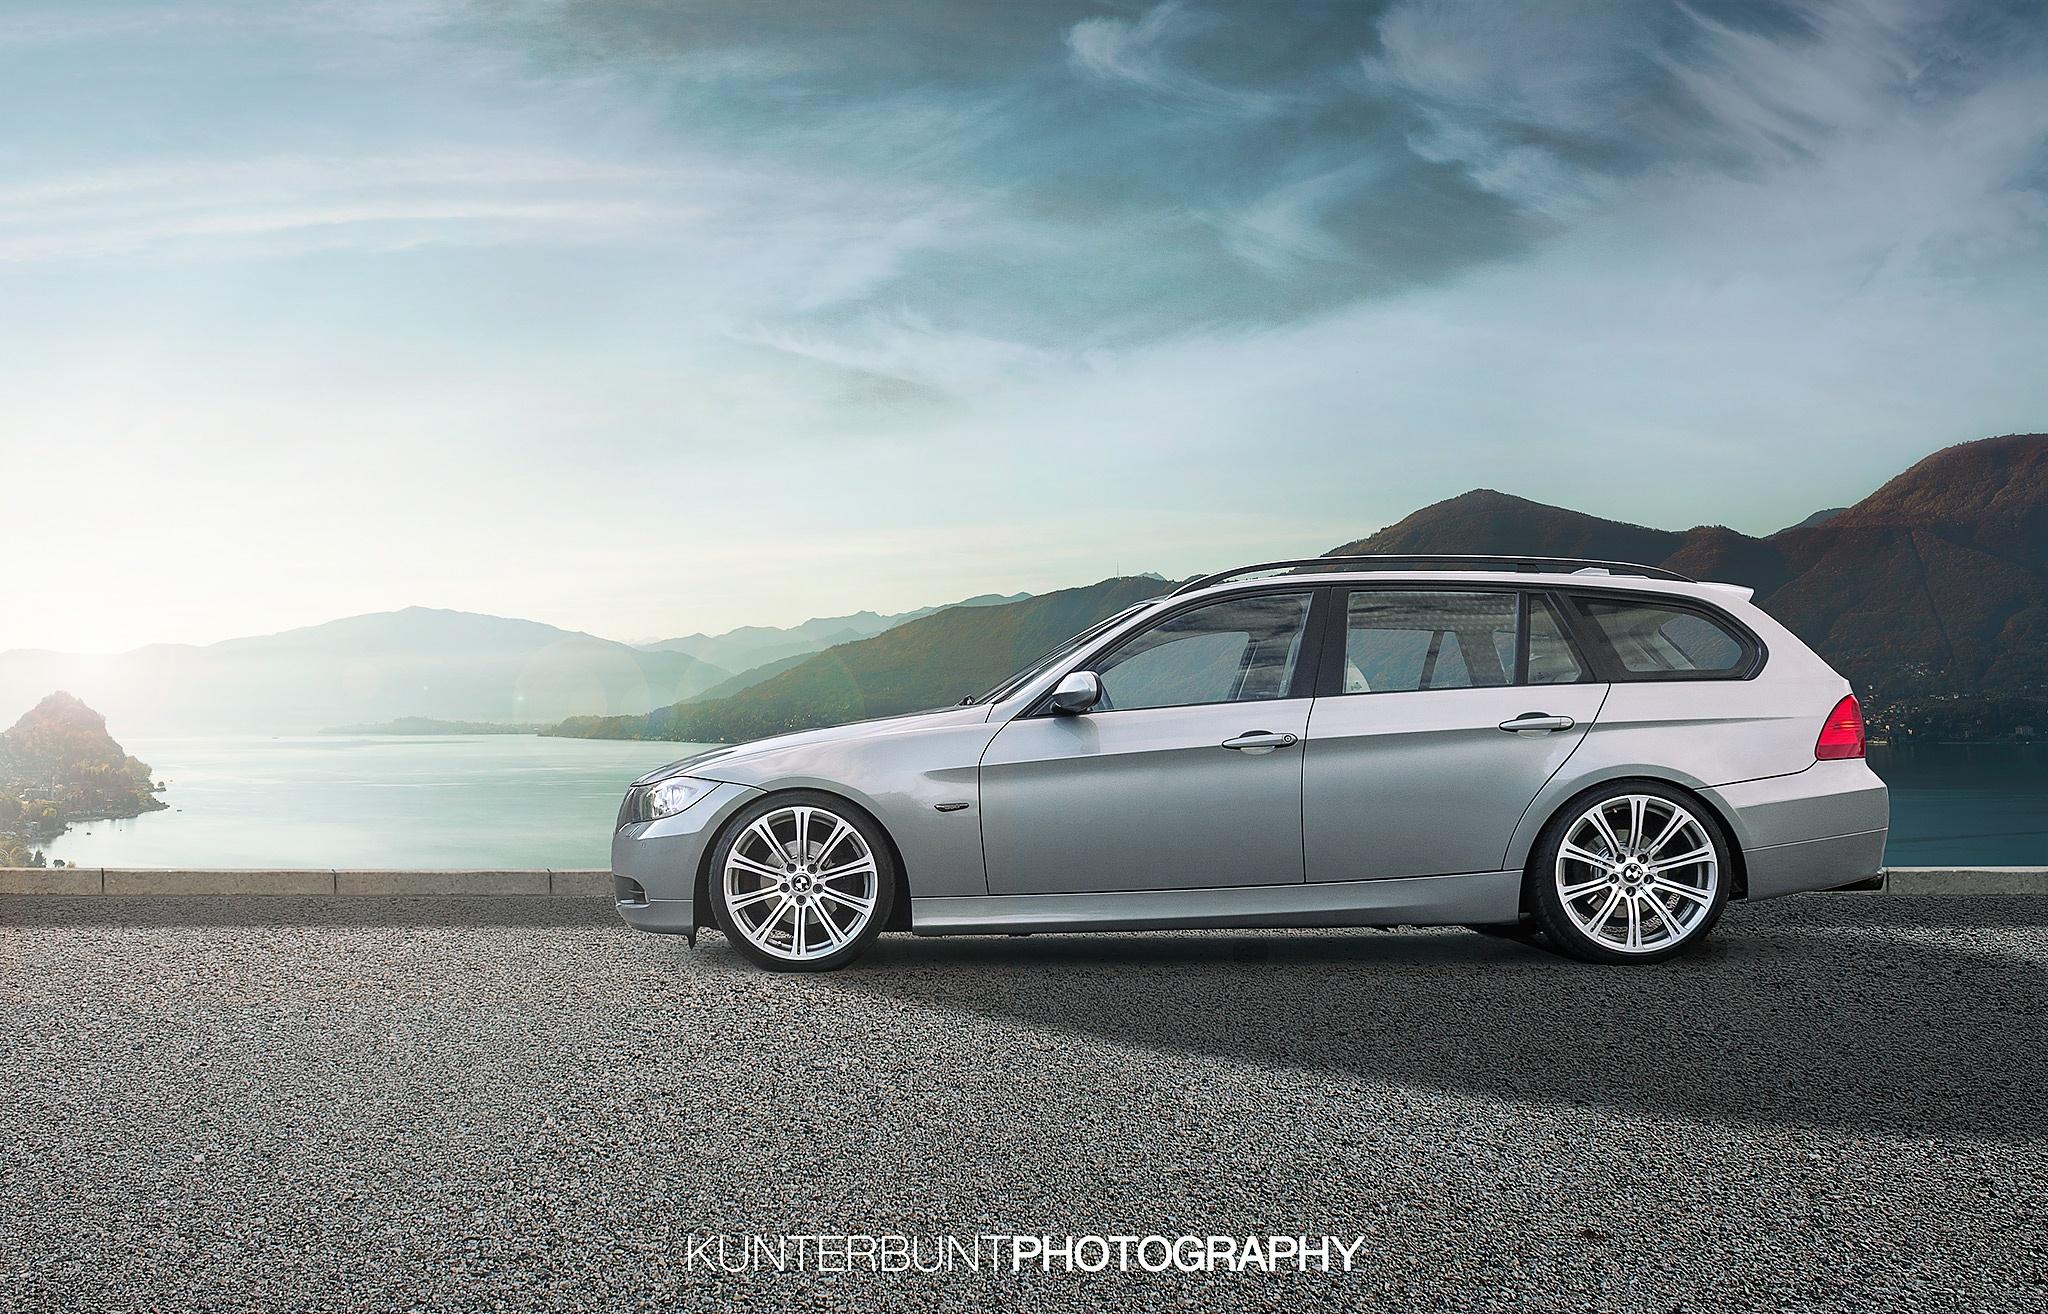 BMW 3 Series by Daniel Dinnebier